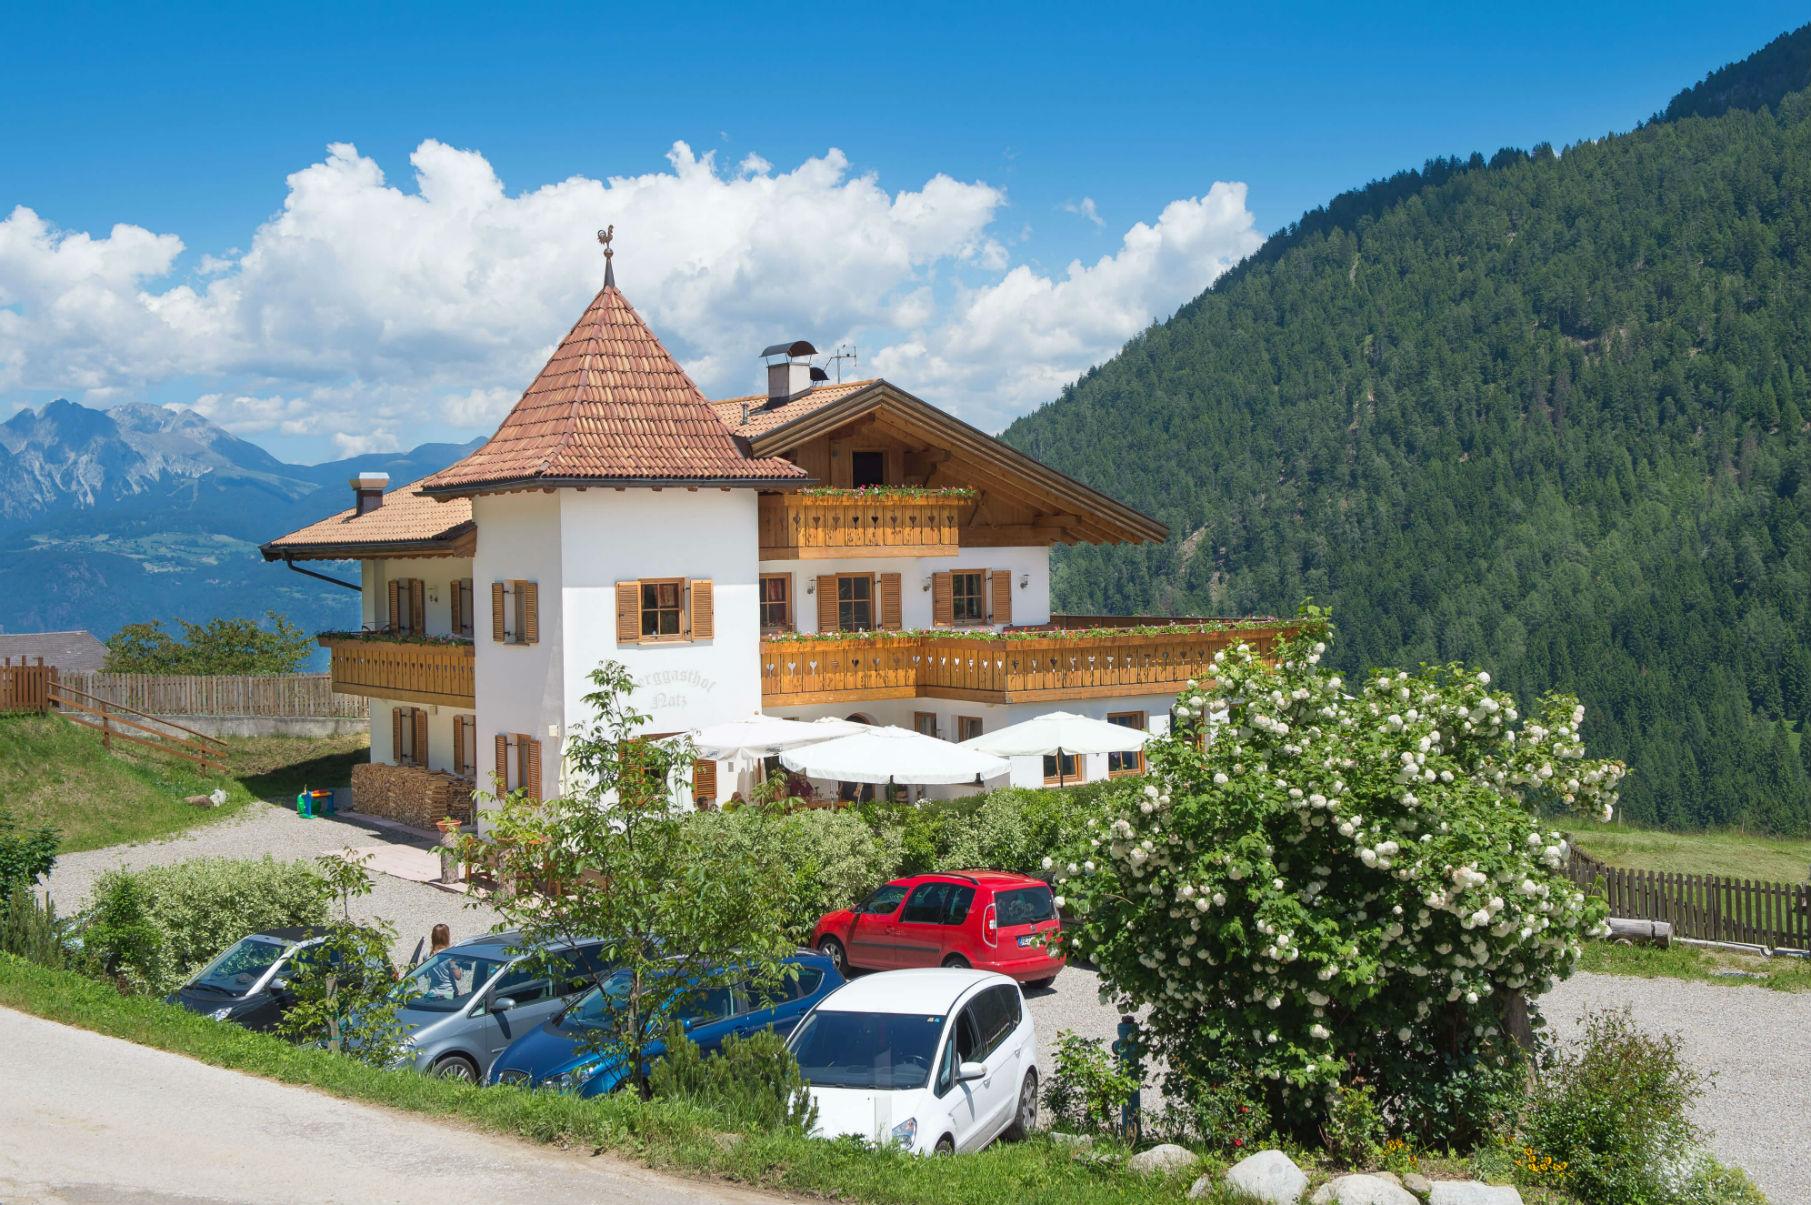 Berggasthaus Natz